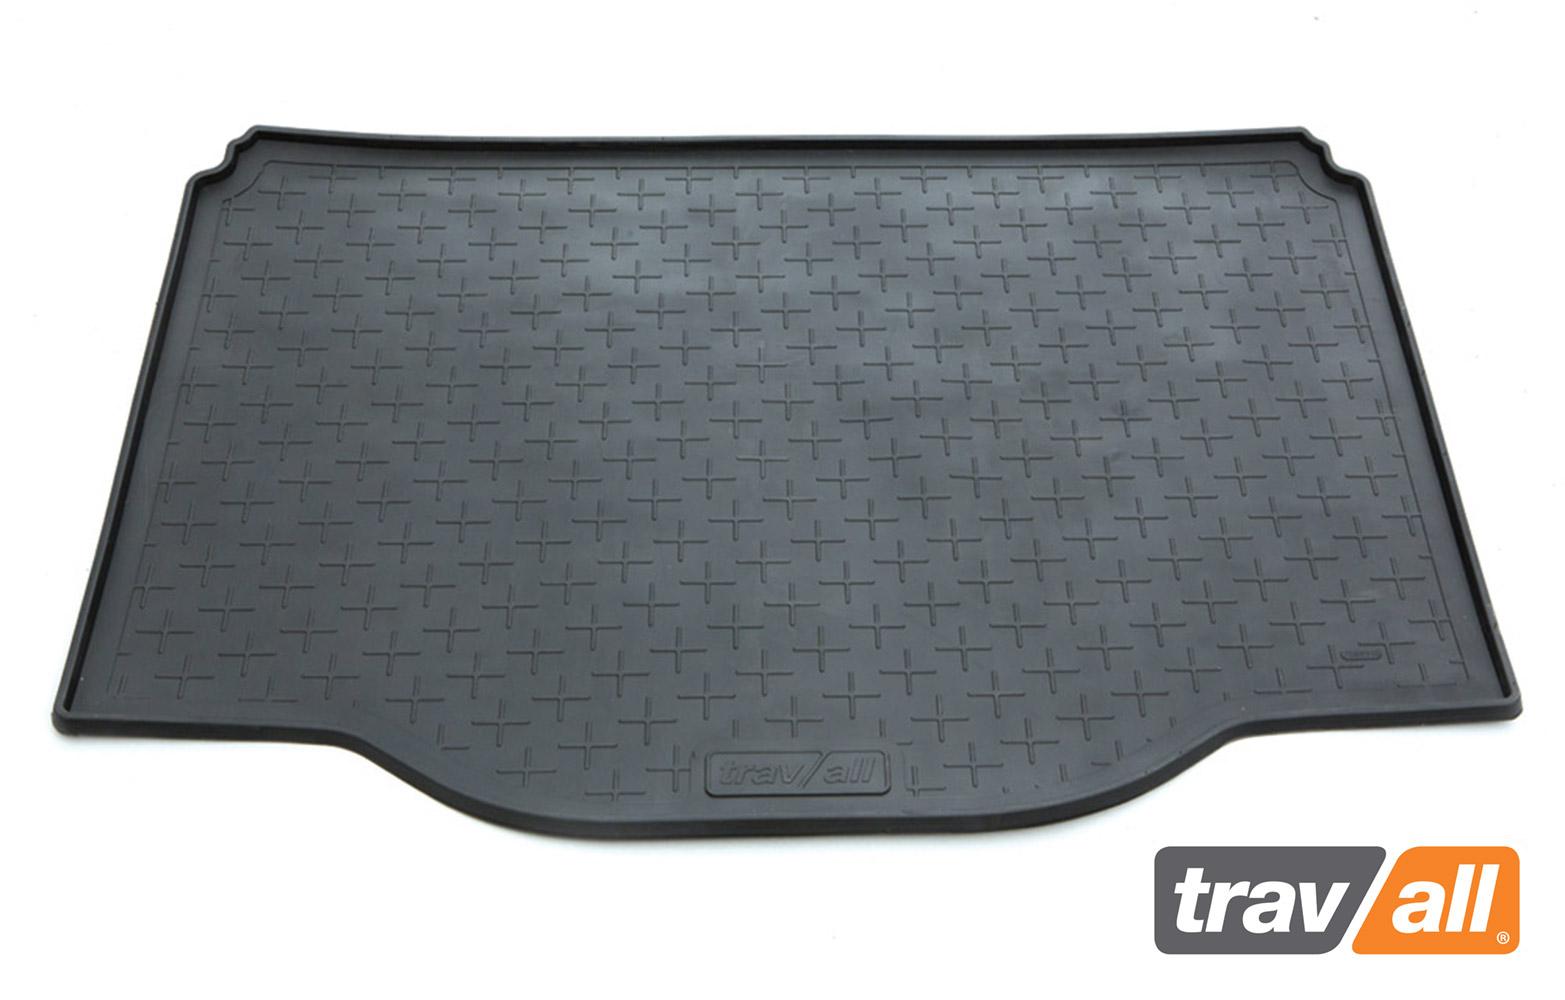 Tavaratilamatto Opel Mokka 2012- / Chevrolt Trax 2013-